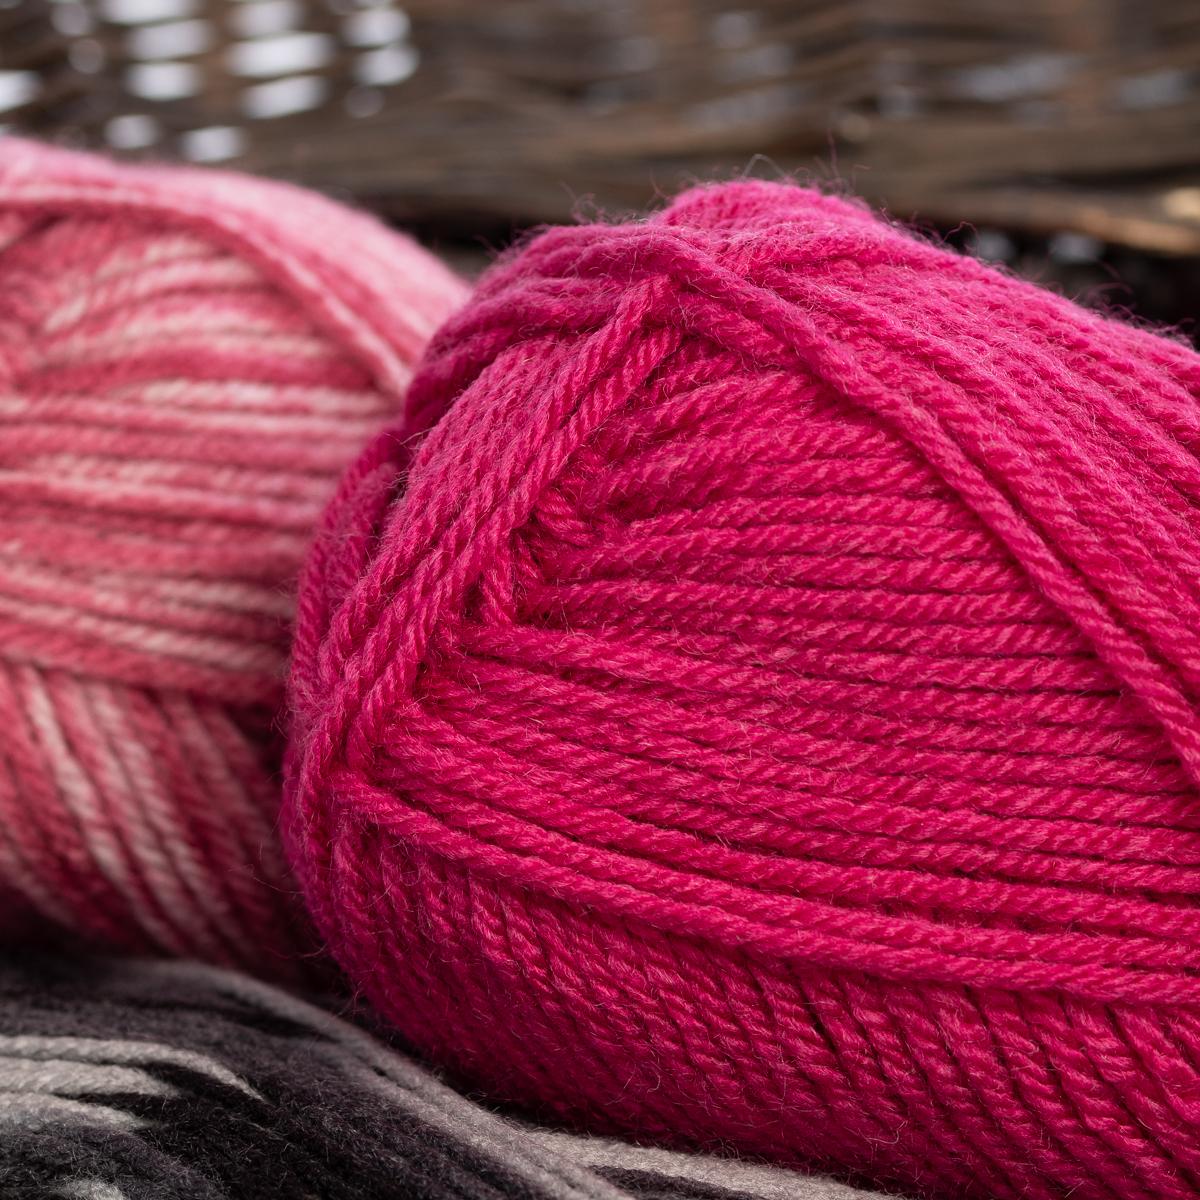 3pk-Lion-Brand-Vanna-s-Choice-100-Acrylic-Yarn-Medium-4-Knitting-Skeins-Soft thumbnail 50